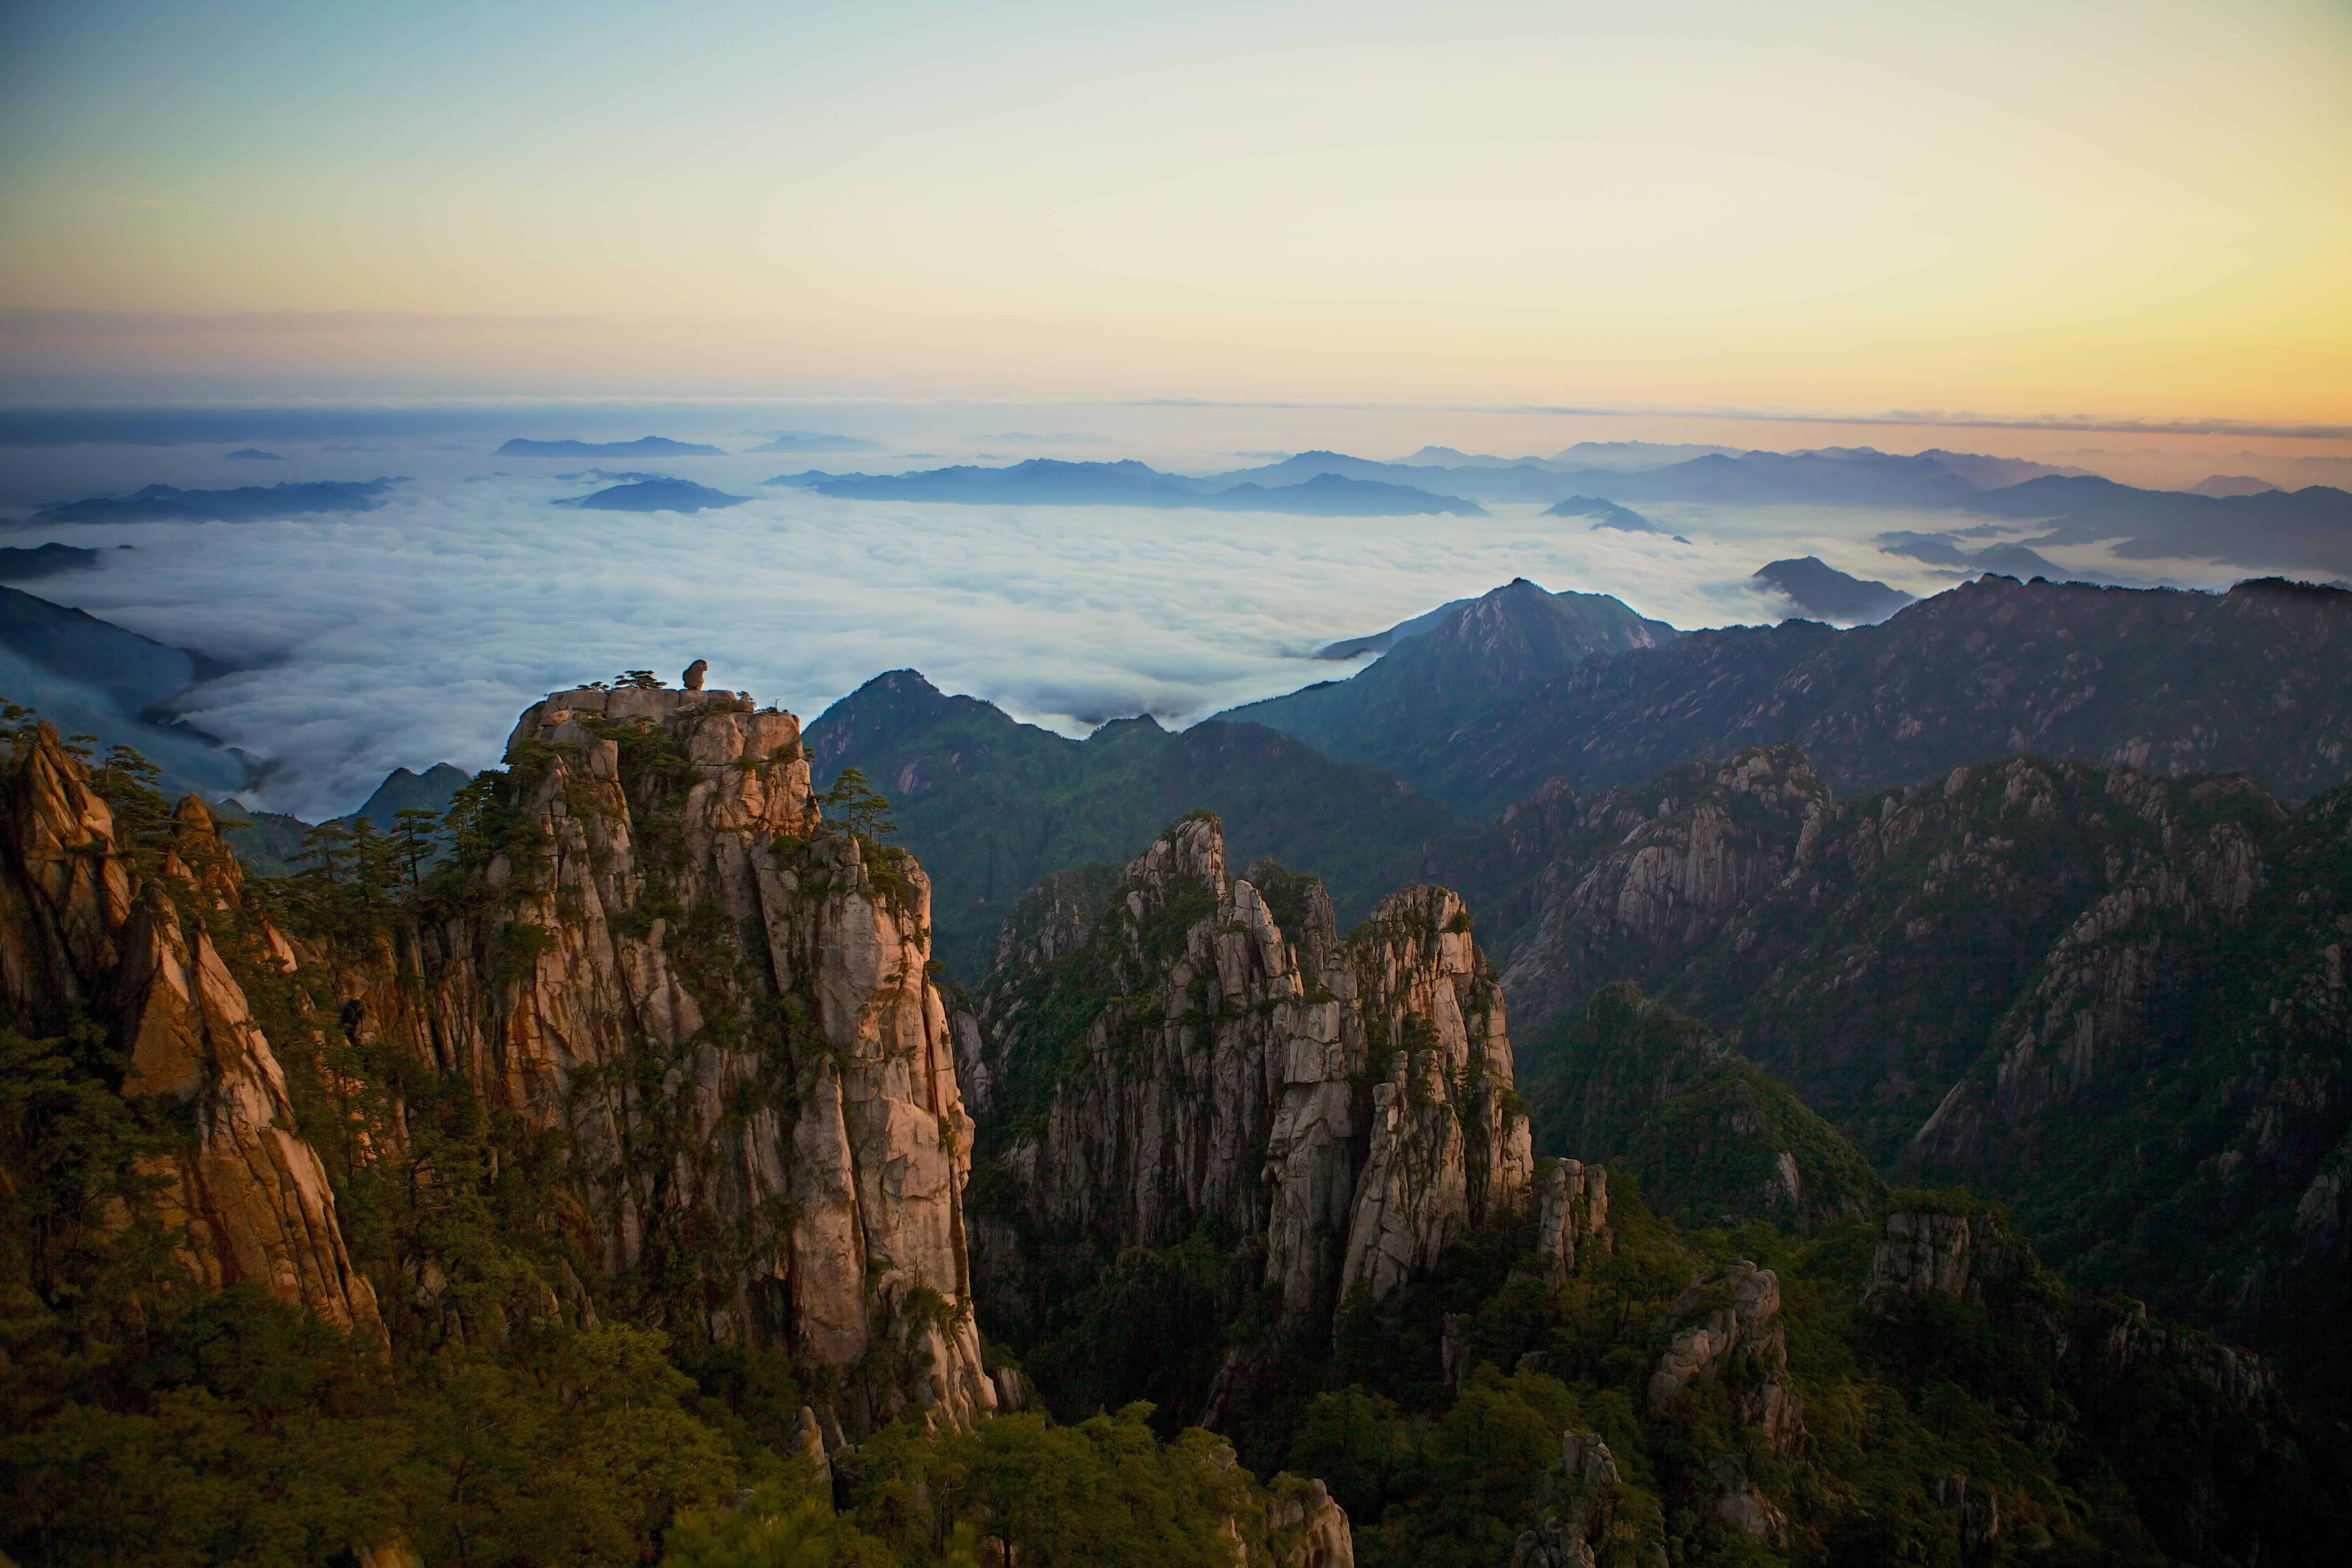 Remarkable, asian mountain range